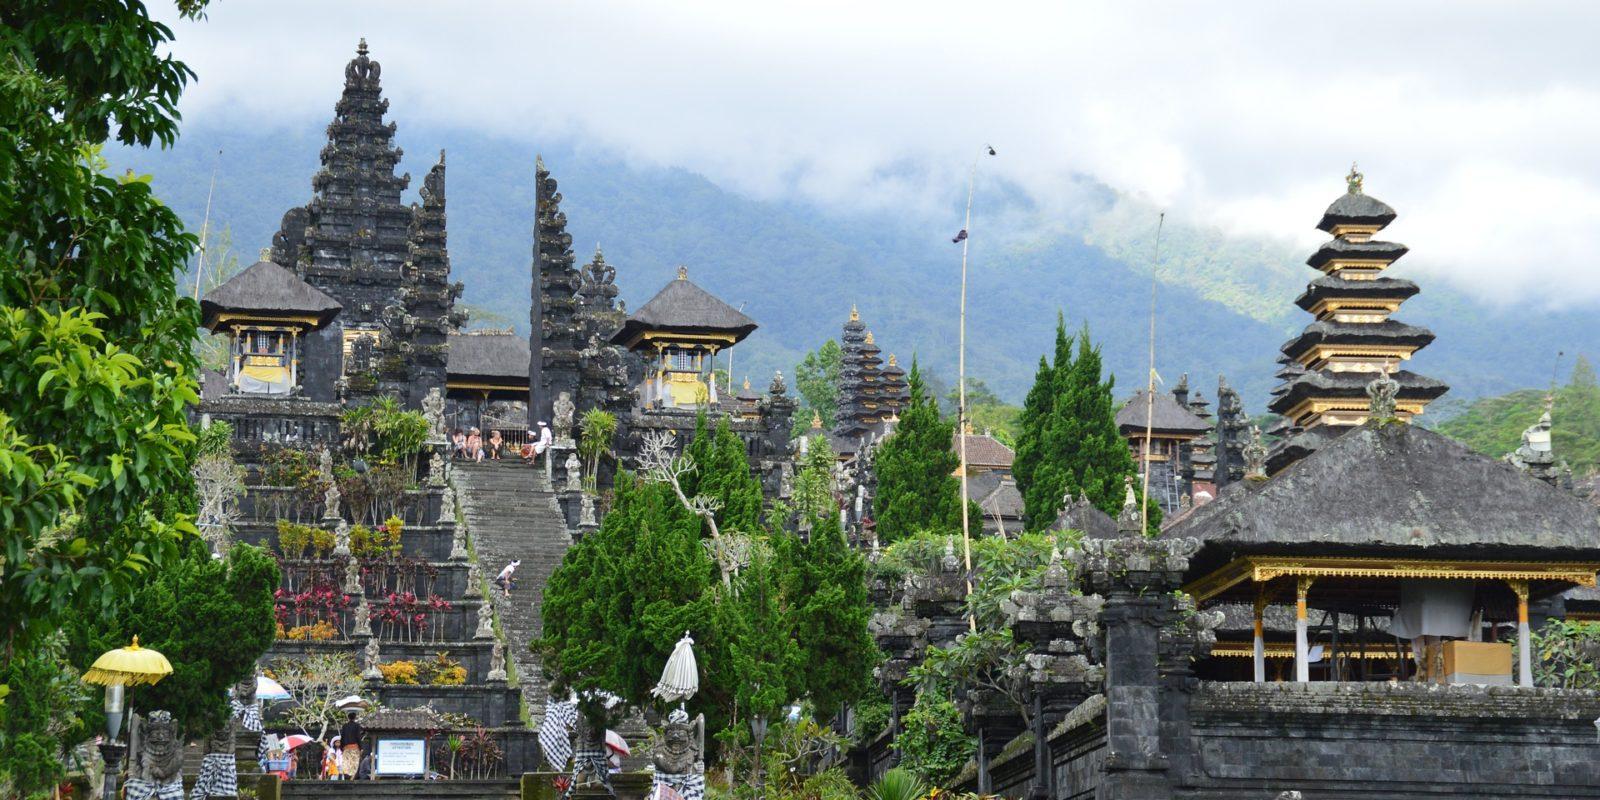 Hindu Temple architecture, Bali, Indonesia.